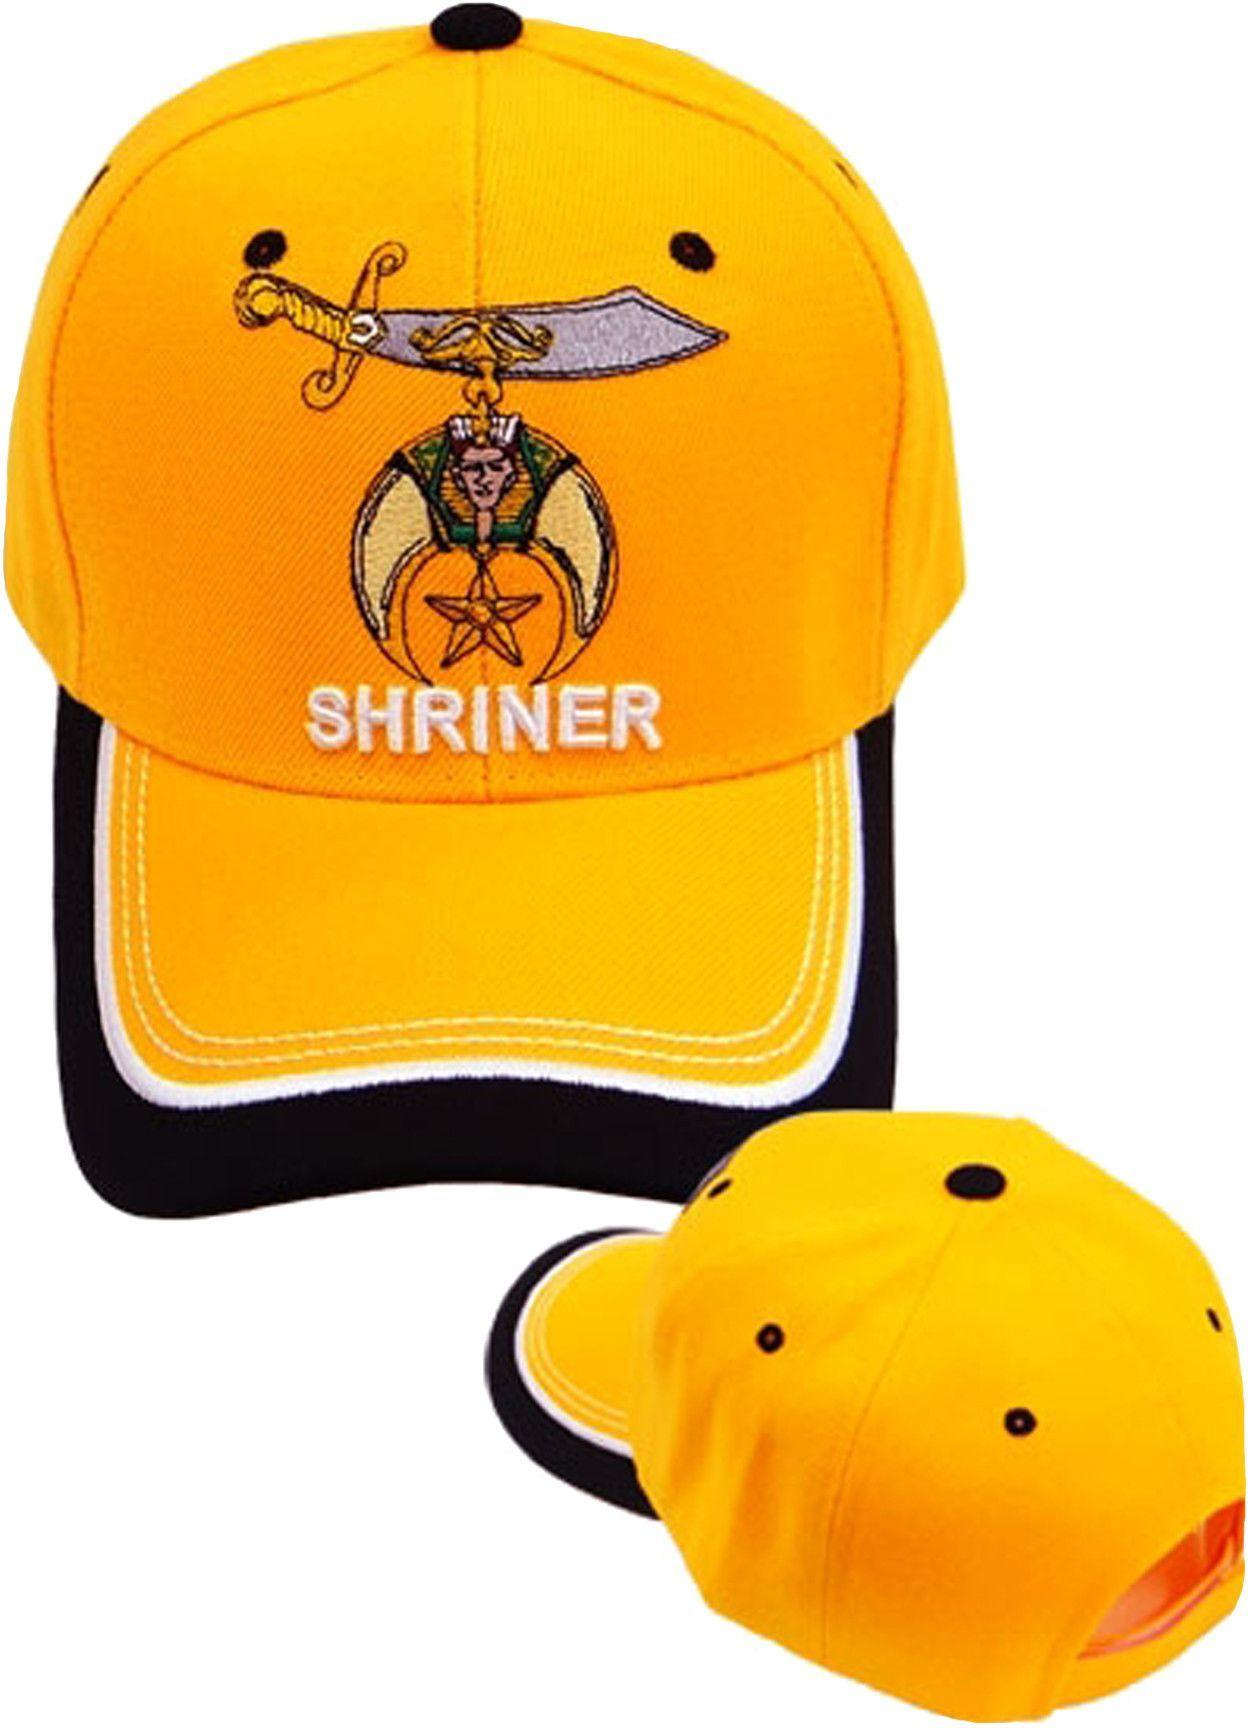 c32fb3c5057 Shriner Hat Orange Baseball Cap with Logo Associated with Freemasons  Shriners Prince Hall Masons Lodge Headwear